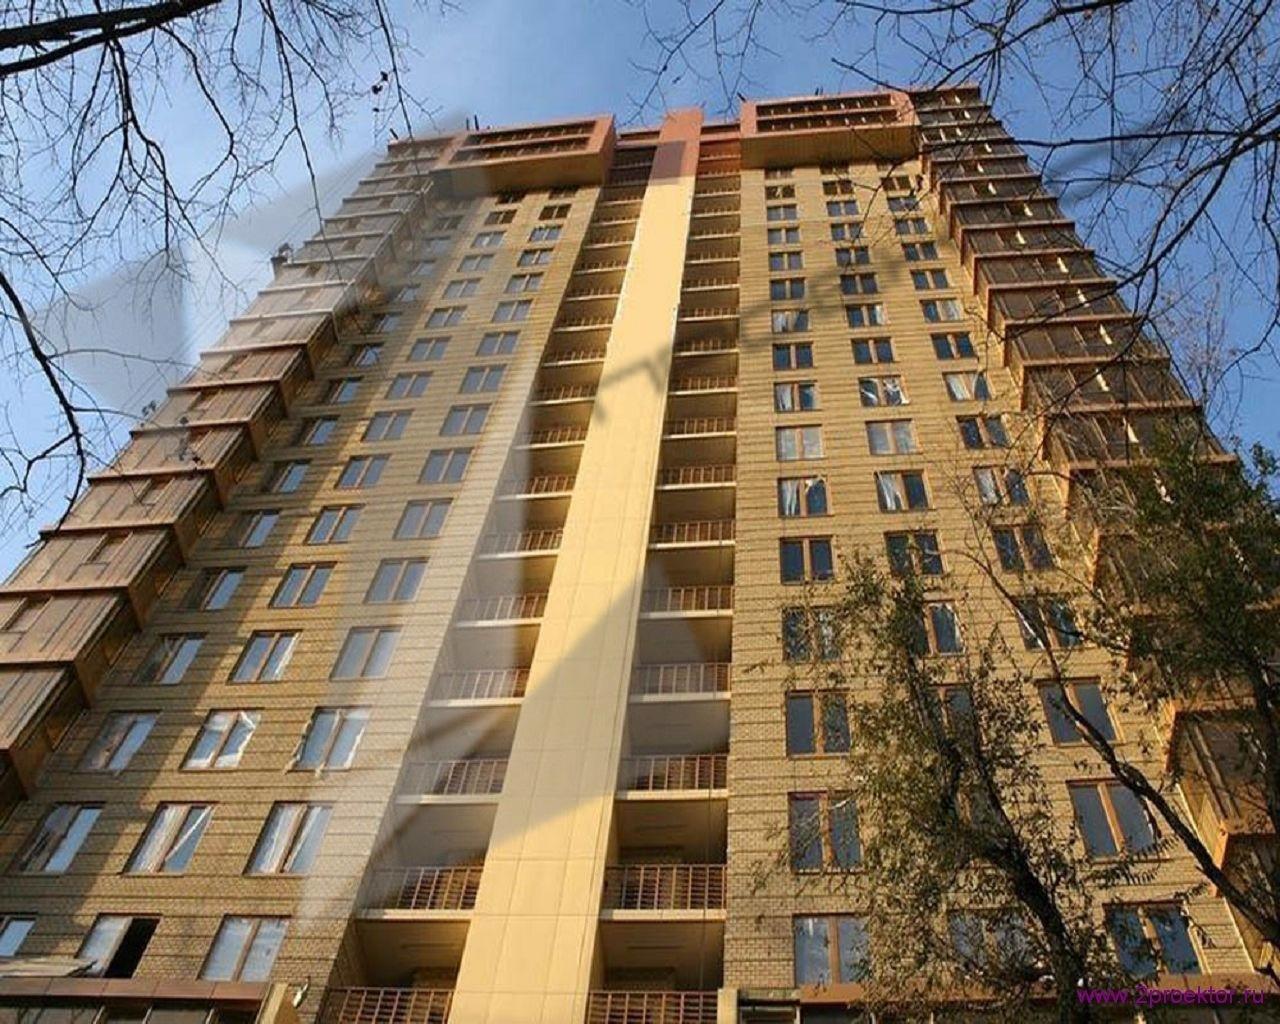 Фасад Жилого комплекса Суворов парк